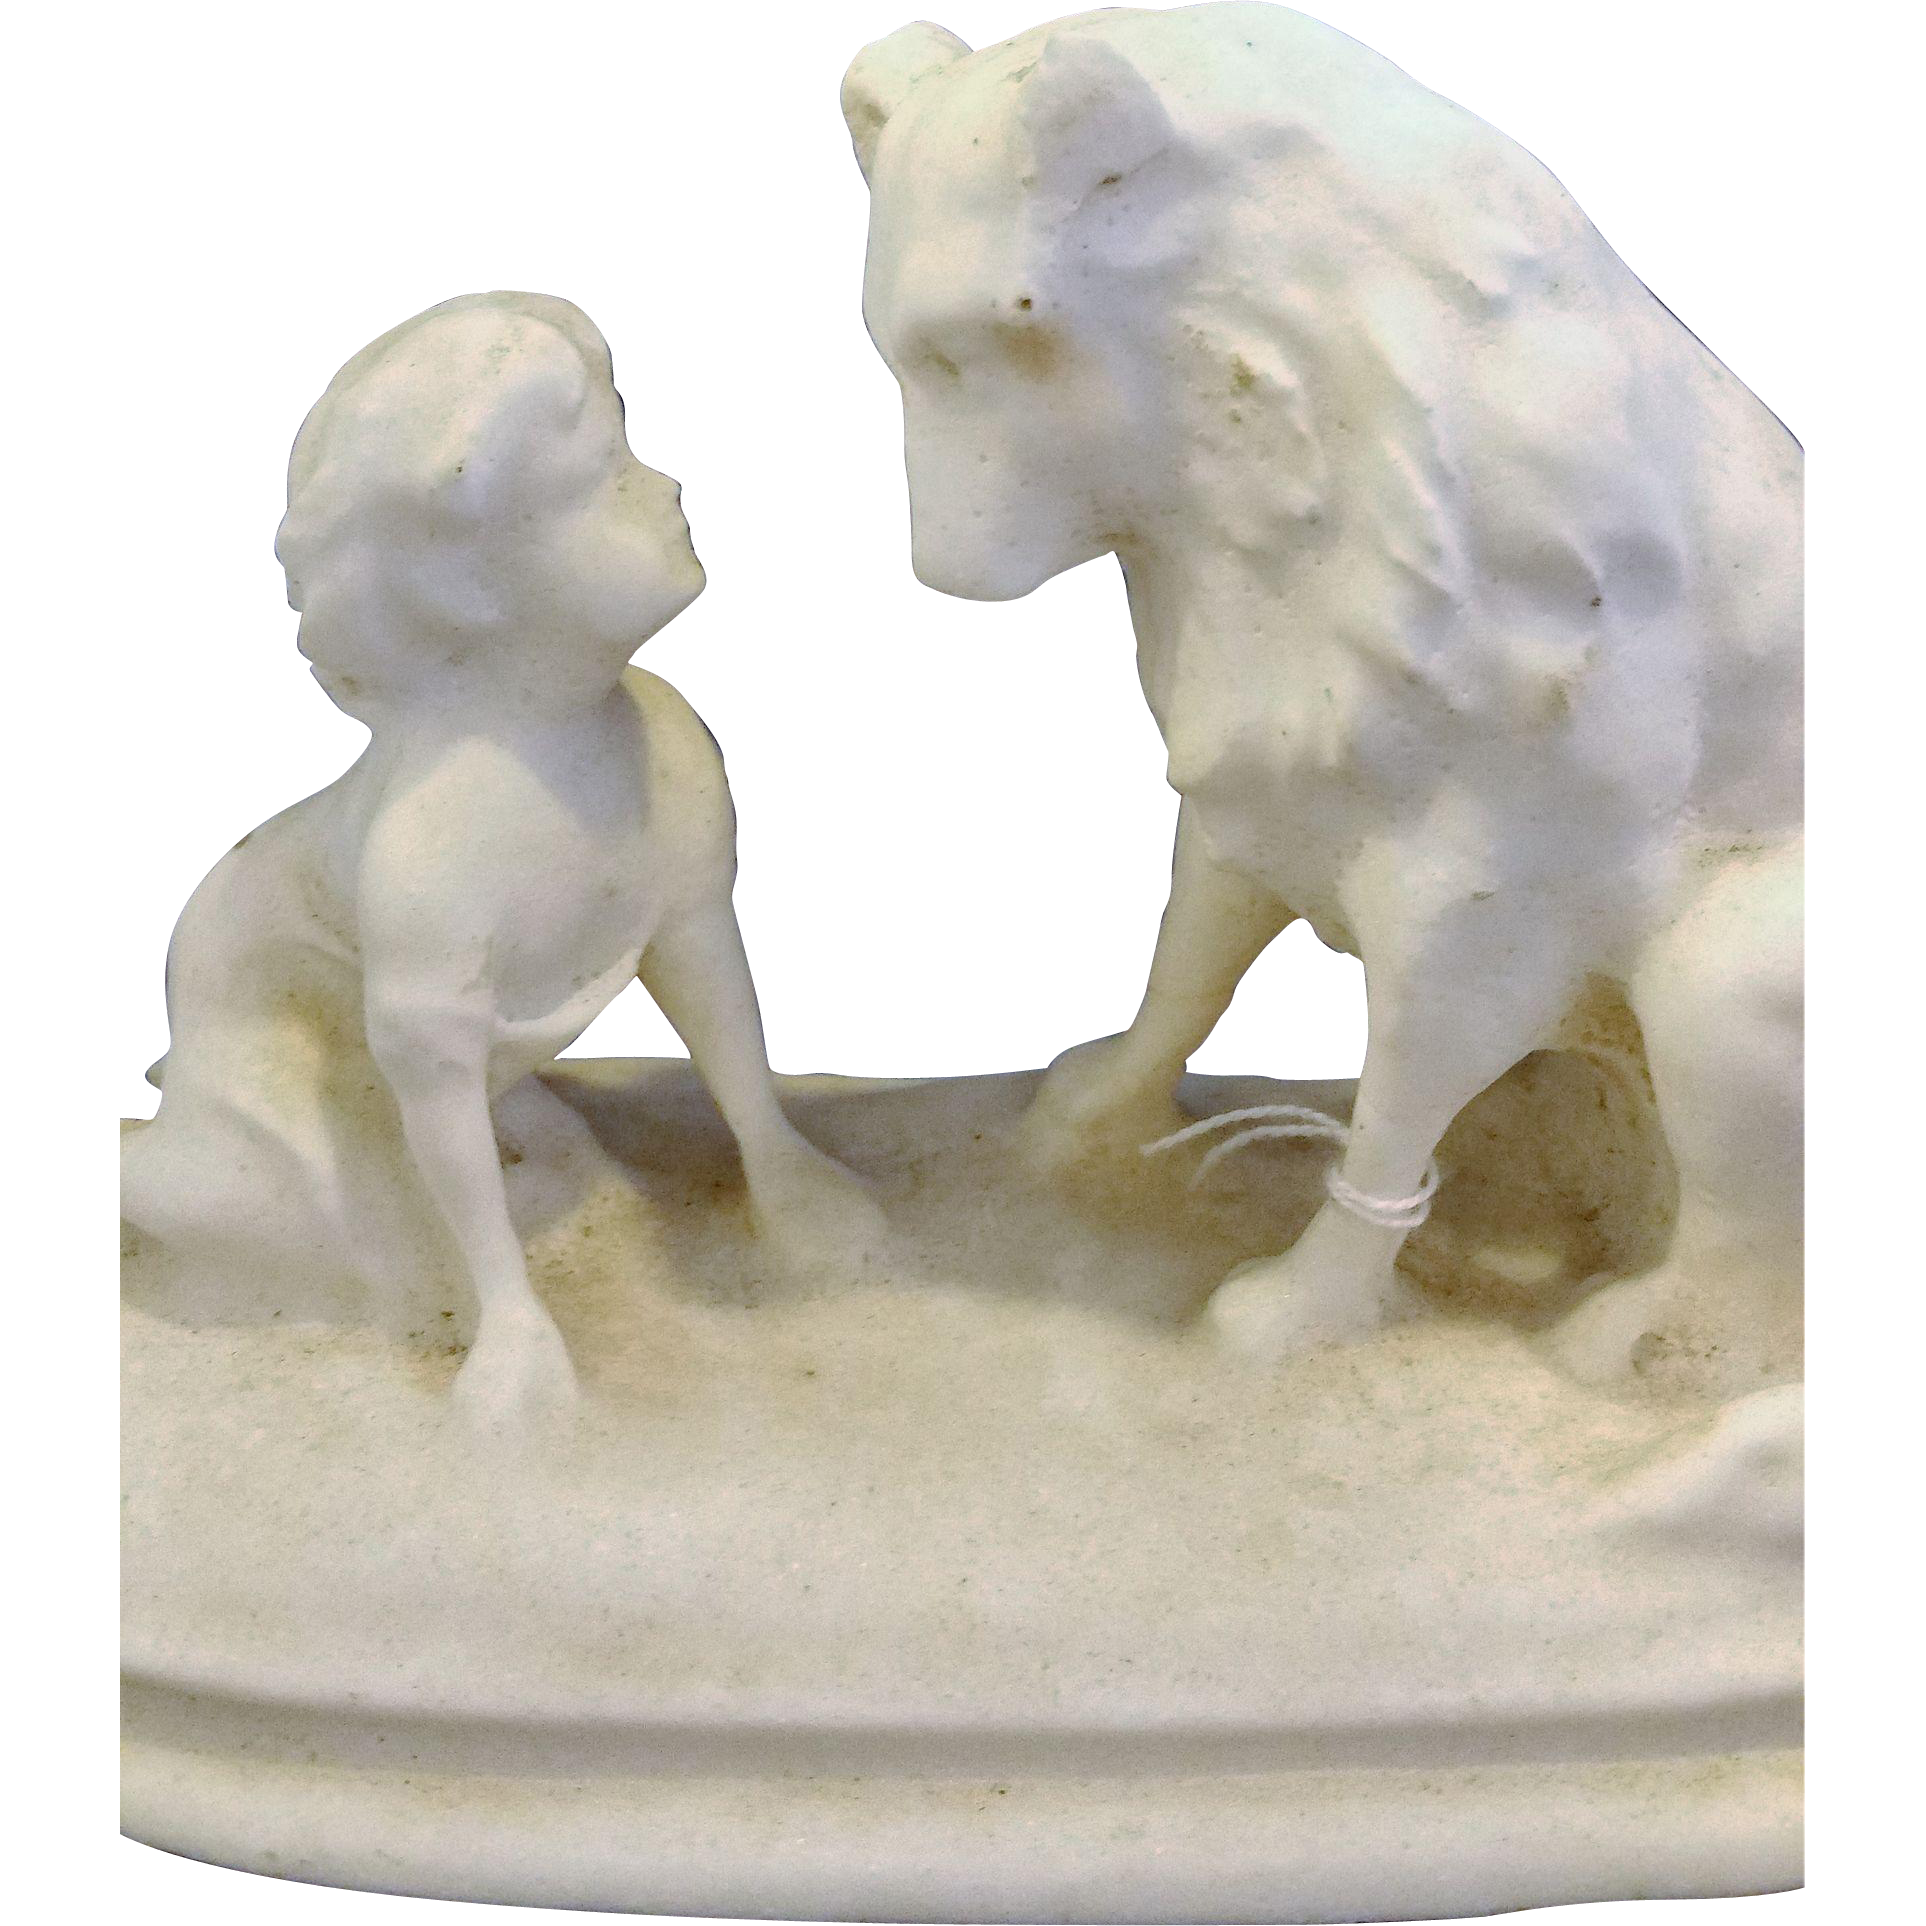 Boy And Dog Molded Salt Statue Figurine